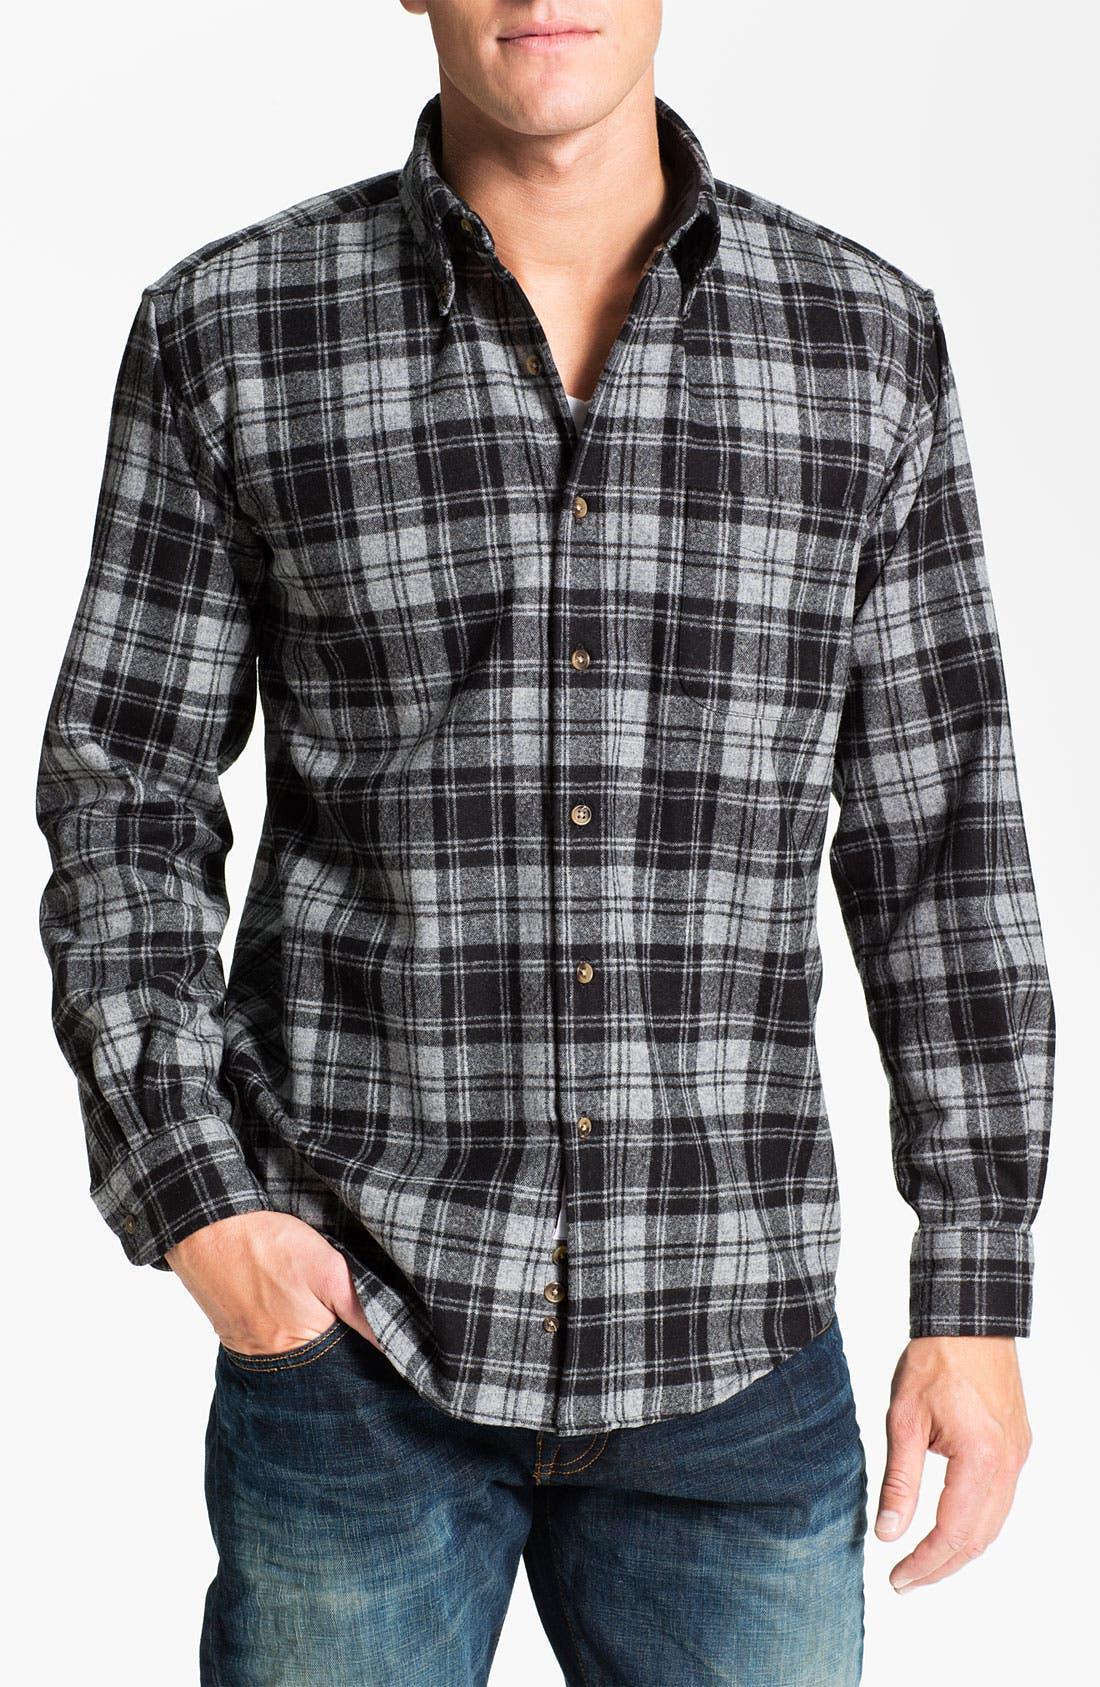 Main Image - Pendleton 'Fireside' Wool Plaid Flannel Shirt